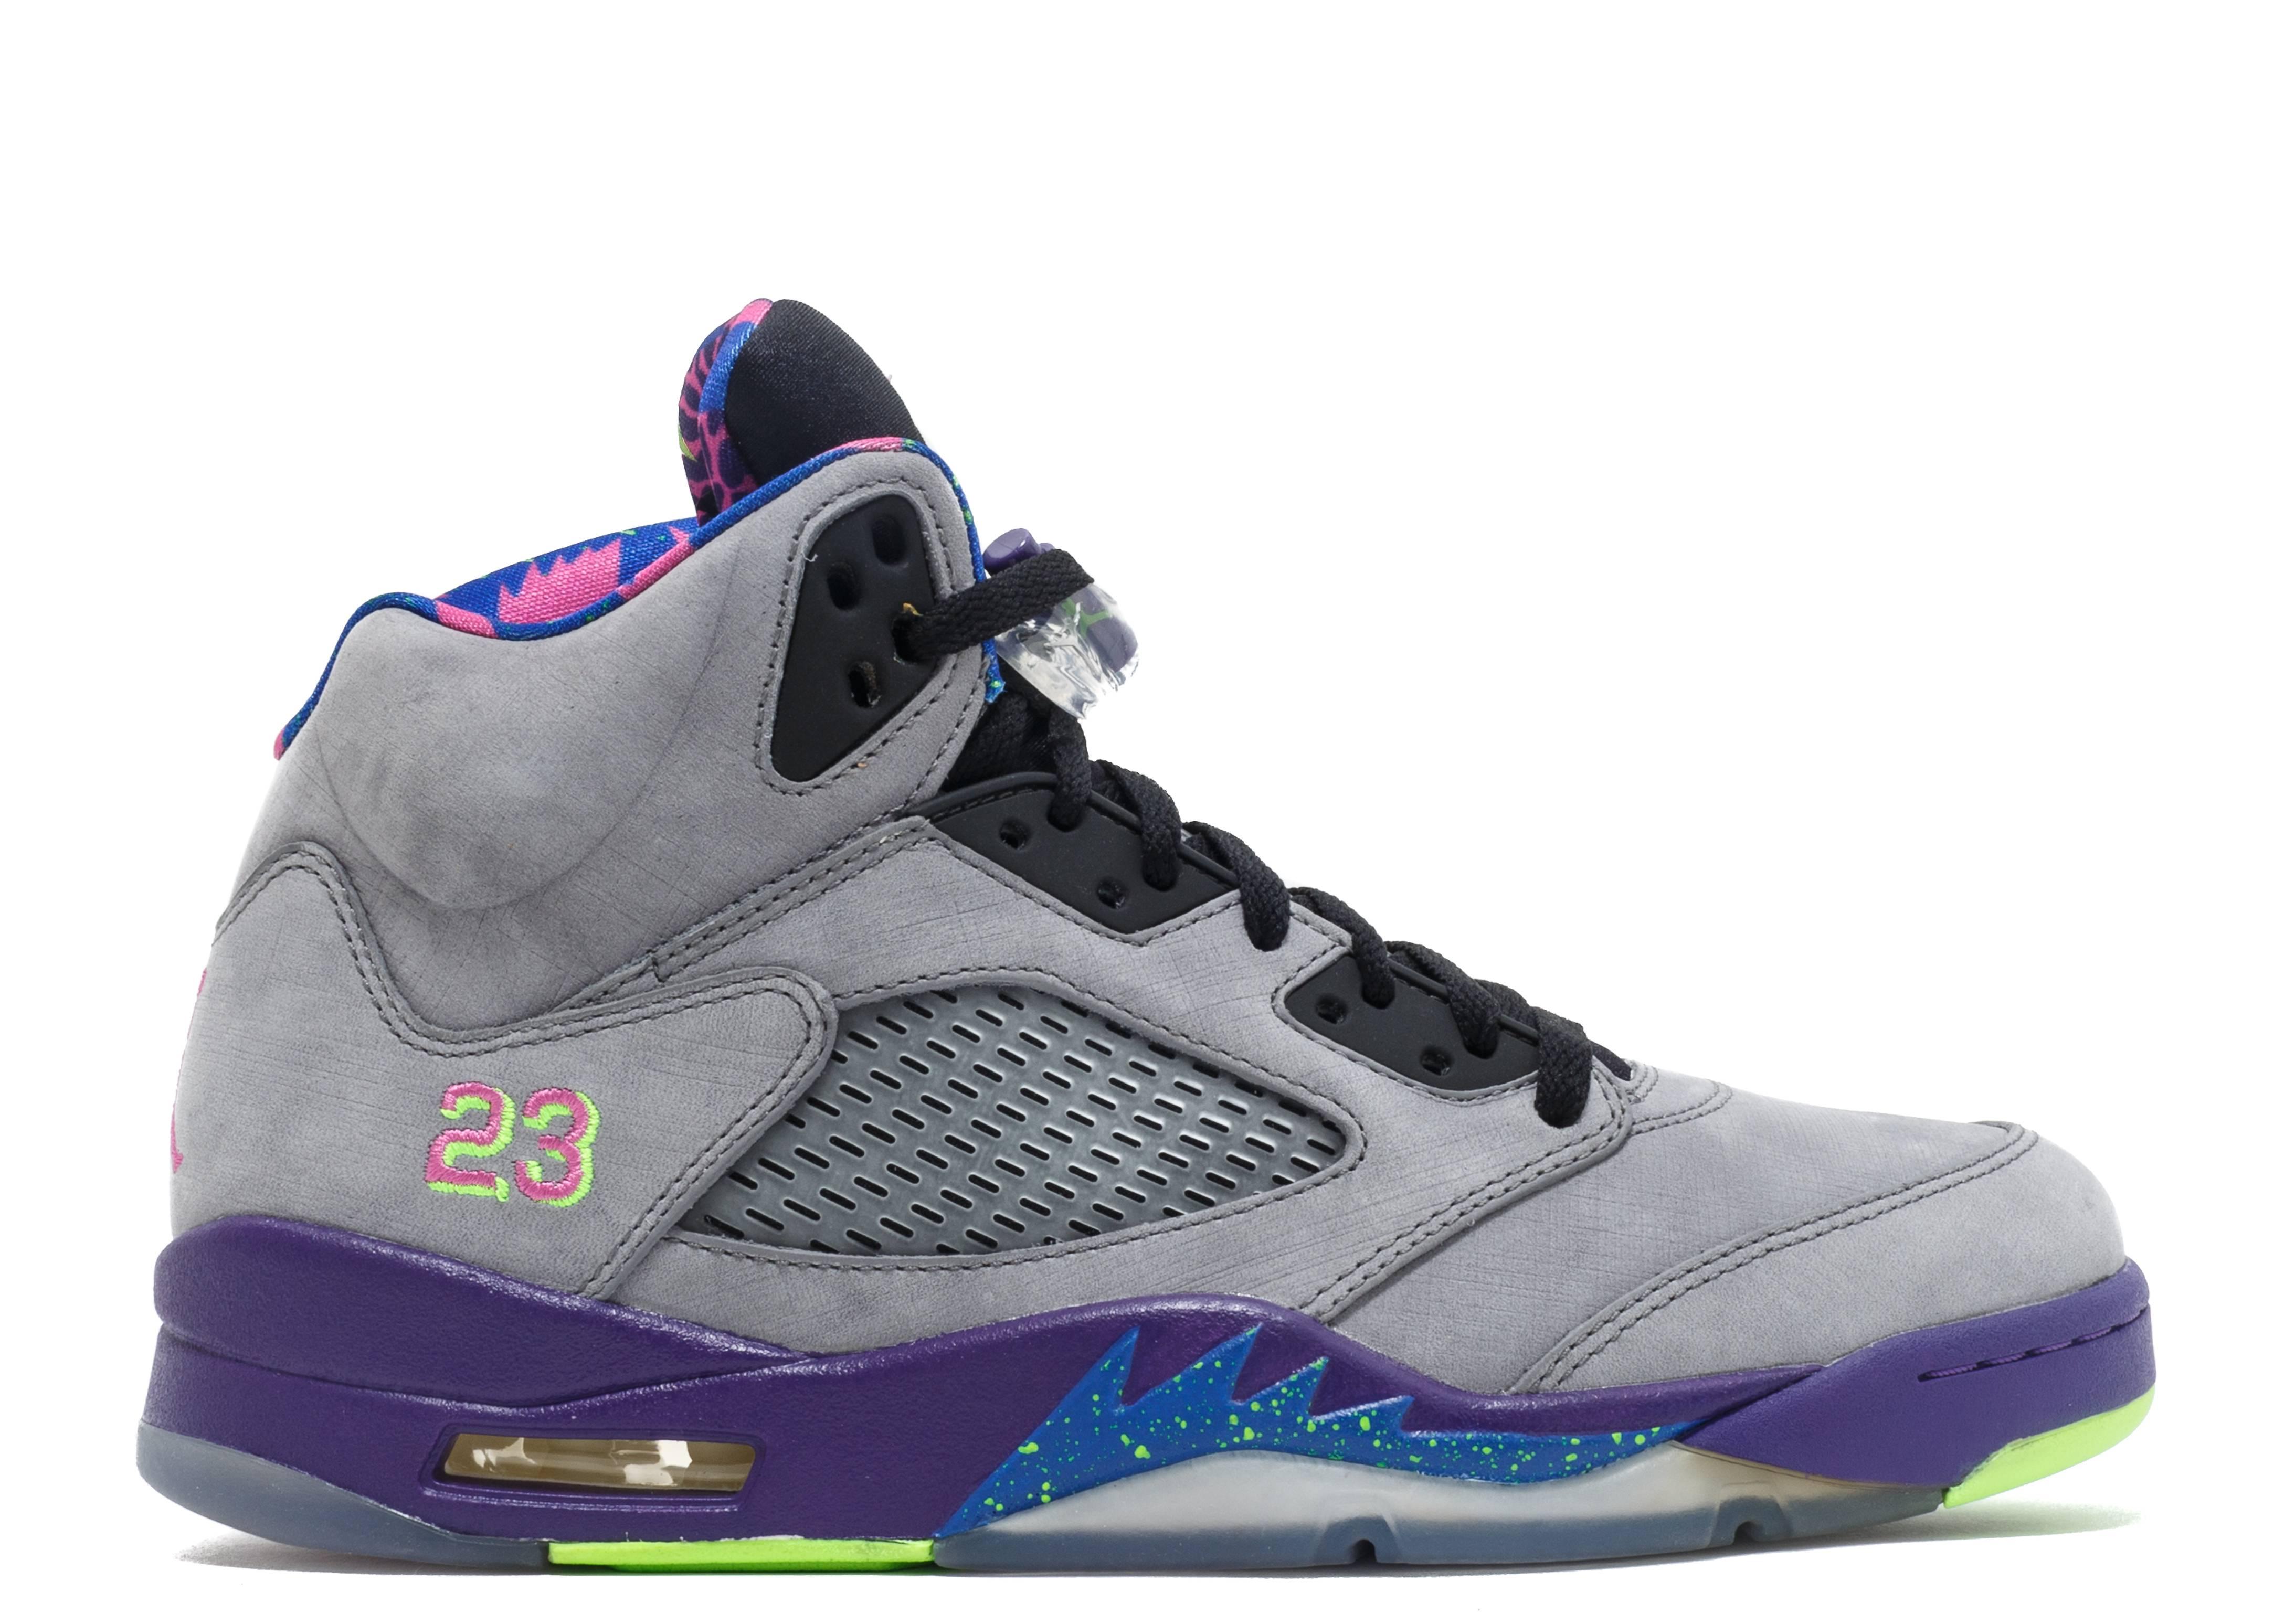 c03b010e06acd7 italy jordan retro 5 purple b0617 5a06e